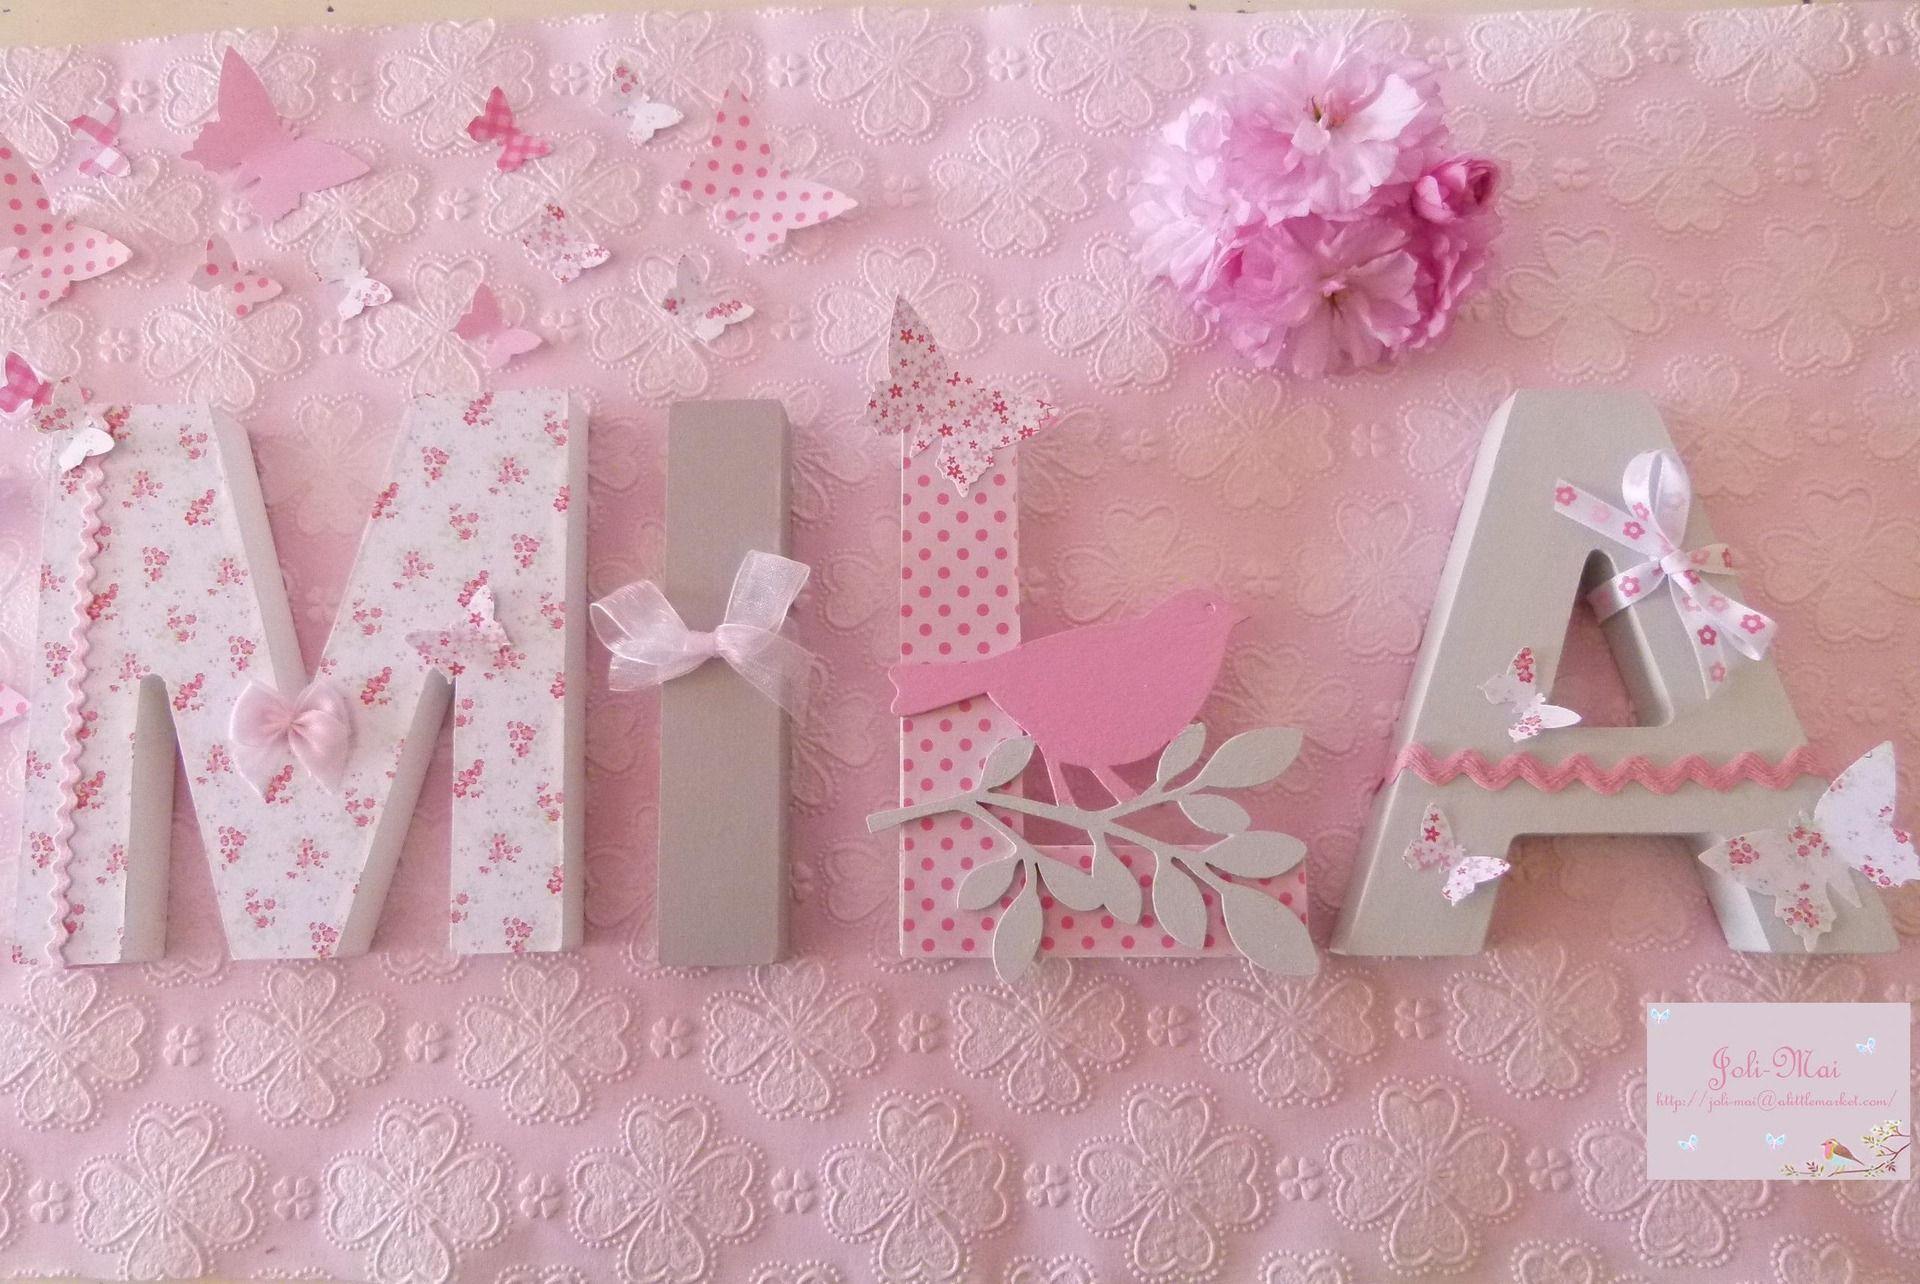 lettre decorative pour chambre bb lovely lettre decorative pour chambre bebe lettre alphabet bb. Black Bedroom Furniture Sets. Home Design Ideas